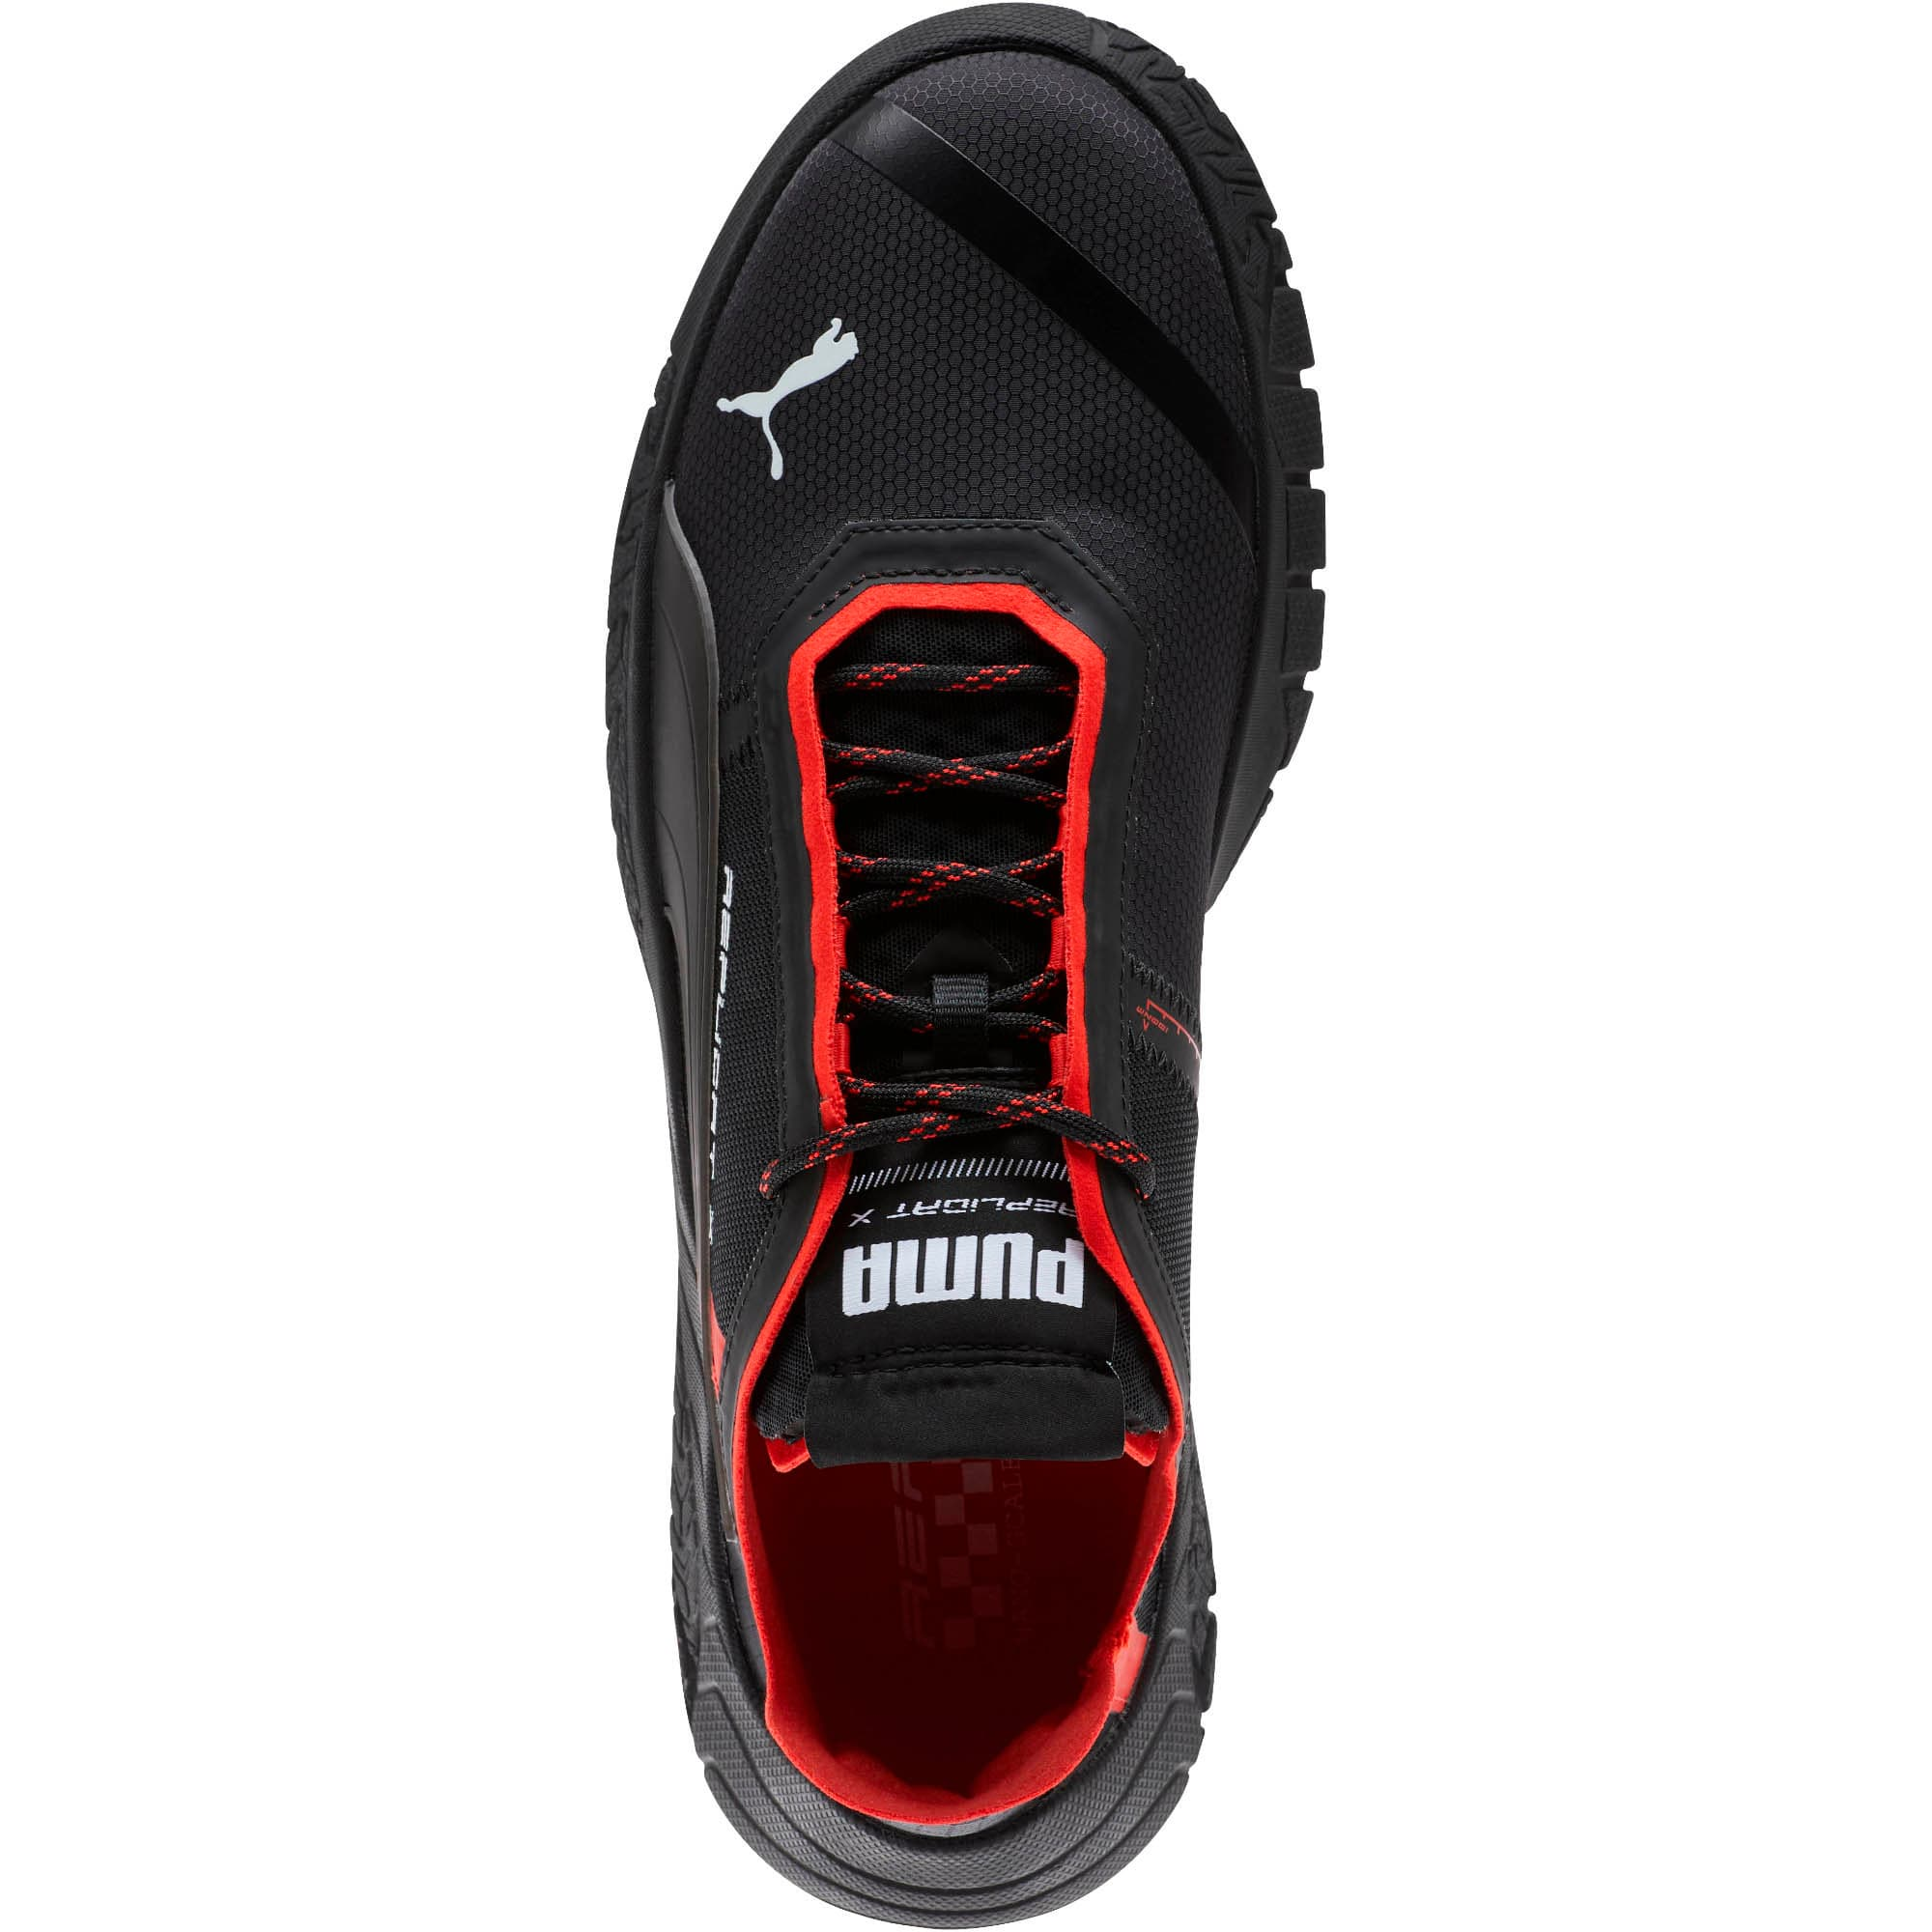 Thumbnail 5 of Replicat-X Circuit Motorsport Shoes, Puma Black-Puma Red, medium